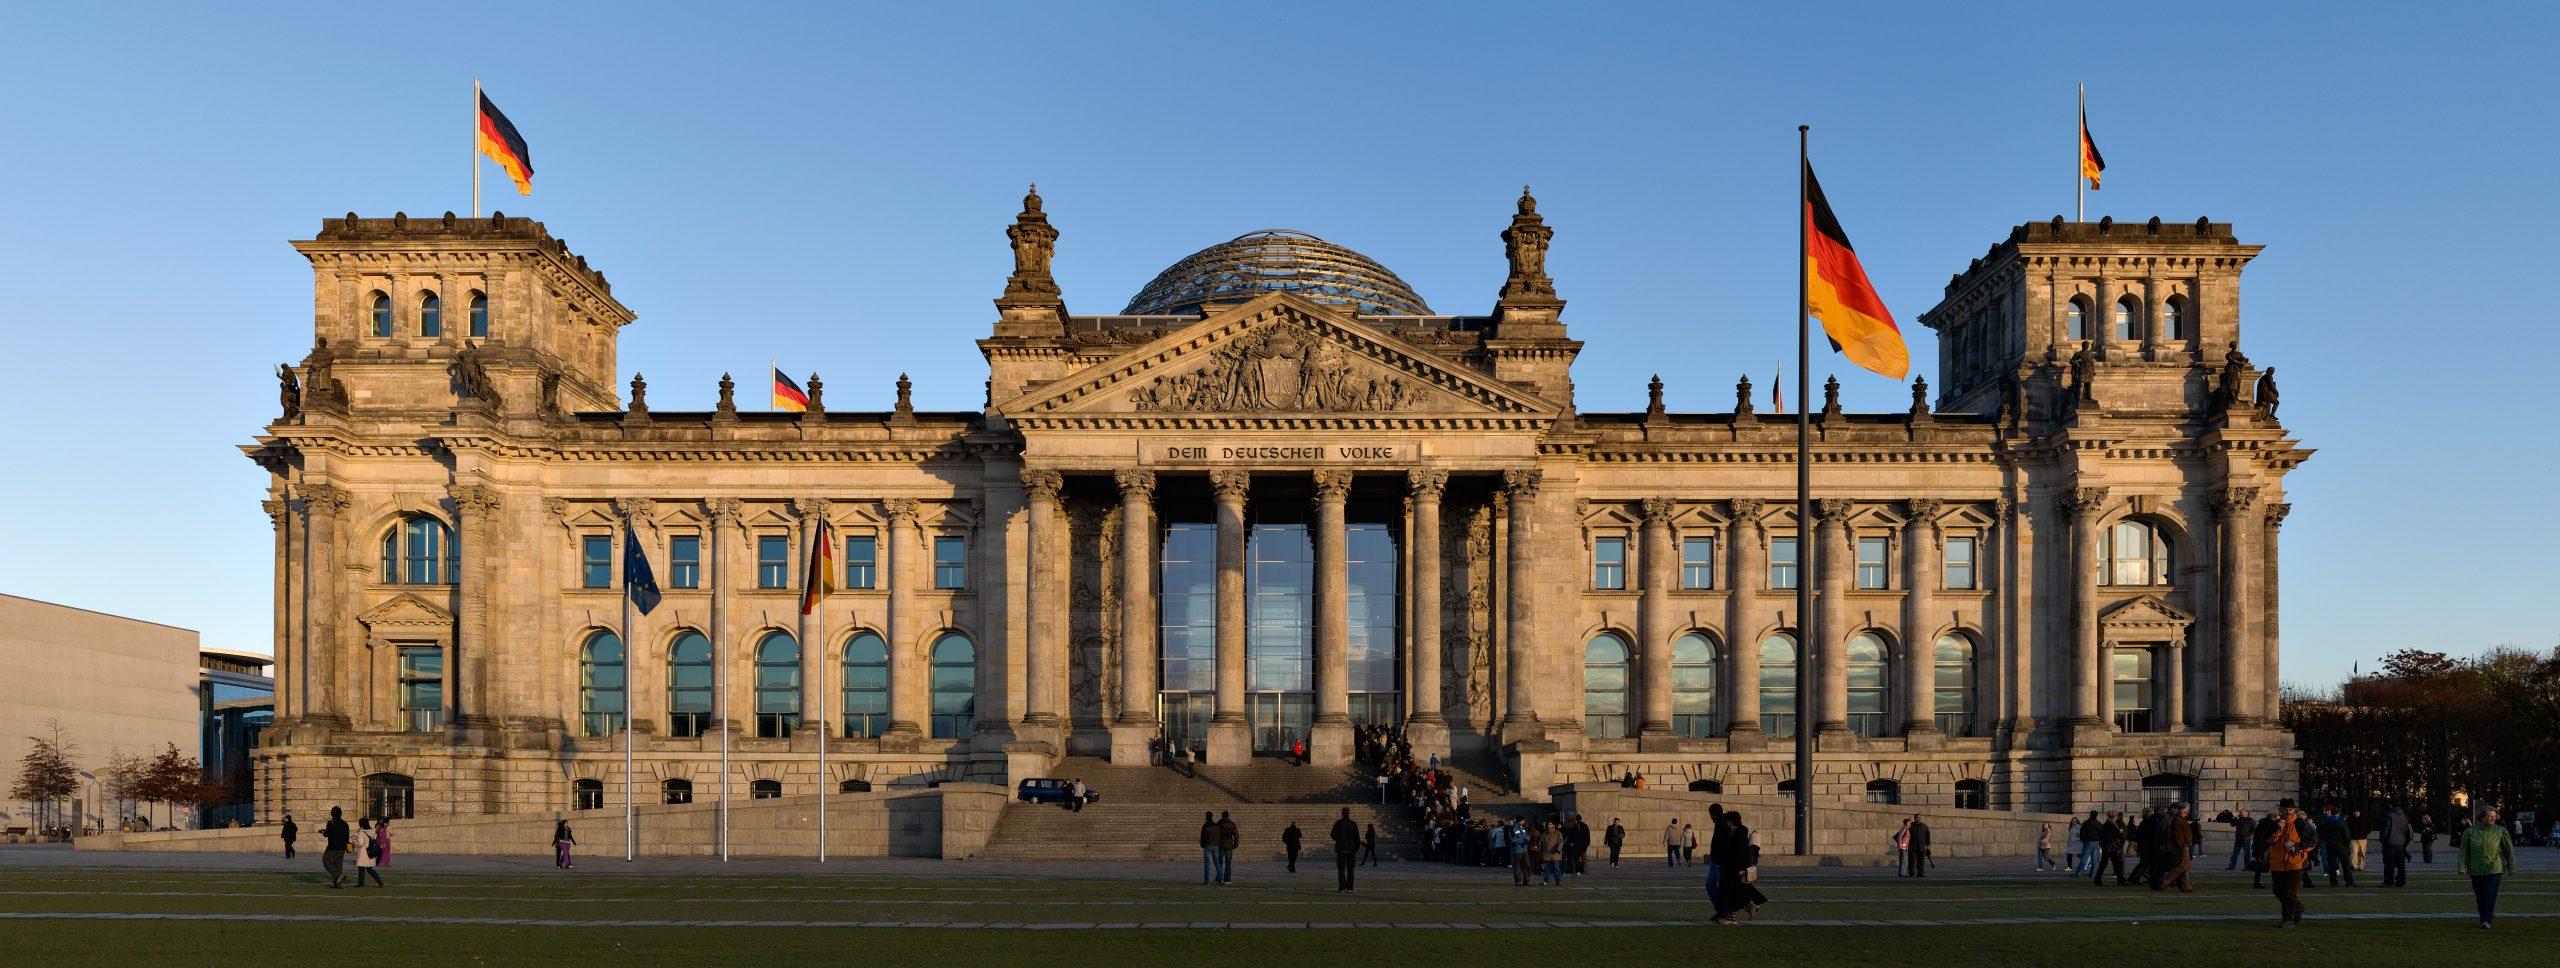 Reichstag Gebäude. Jürgen Matern / Wikimedia Commons. https://juergen-matern.de/ Lizenz: Creative Commons (CC BY-SA 3.0), https://creativecommons.org/licenses/by-sa/3.0/legalcode